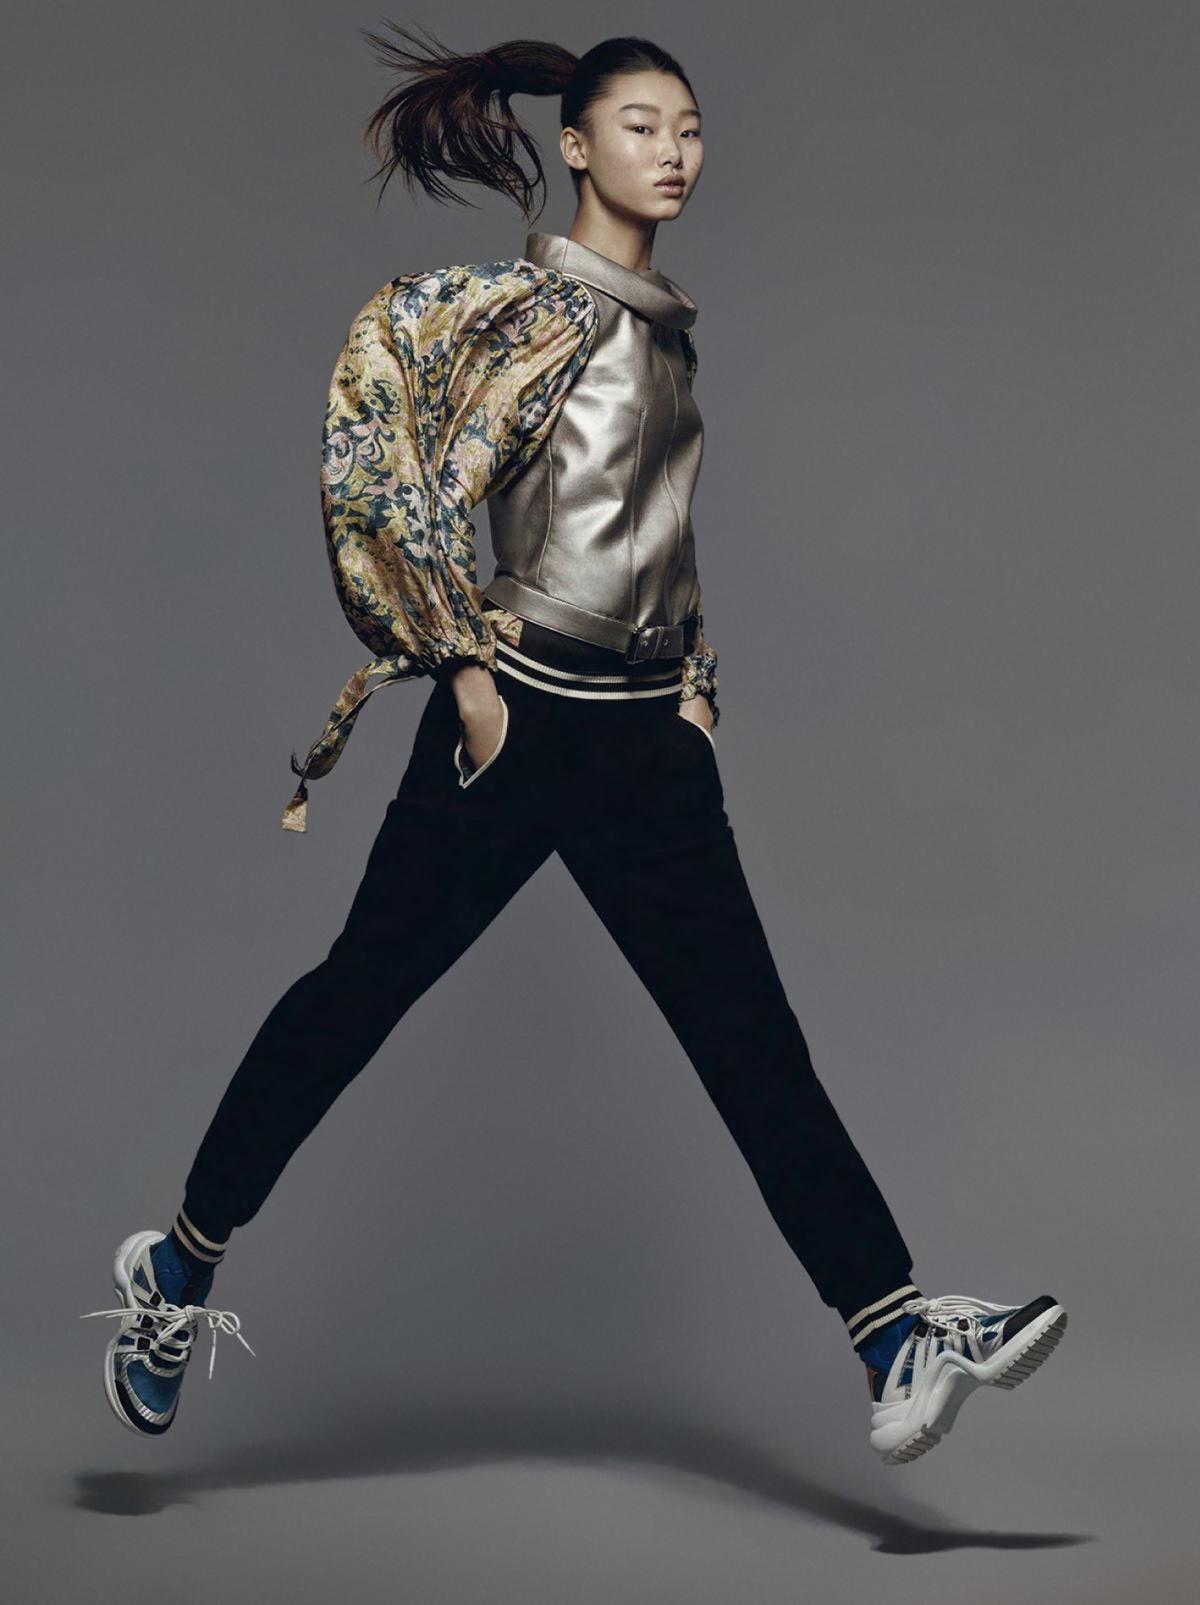 Generation Next by Craig McDean Vogue UK May 2018  (8).jpg